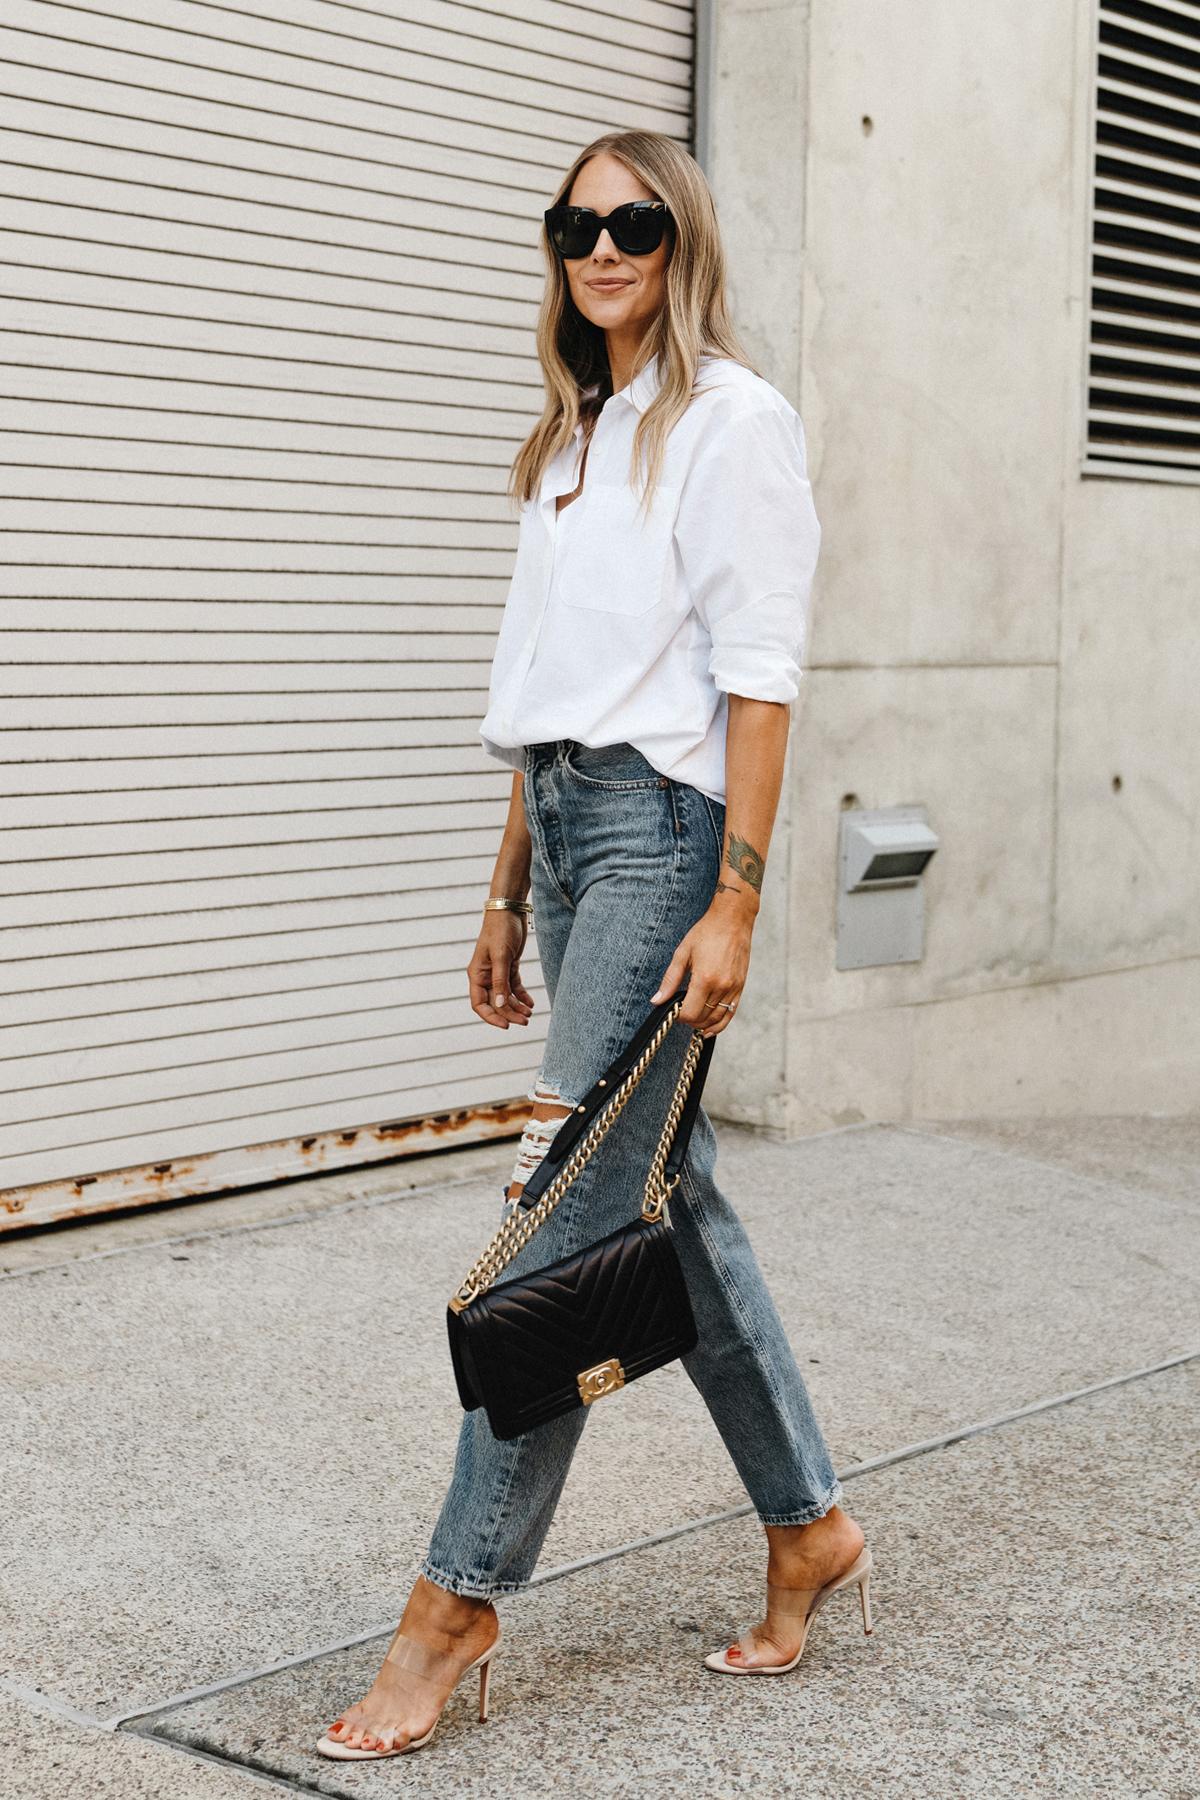 Fashion Jackson Wearing Jenni Kayne White Button Up Shirt AGOLDE Ripped Jeans Schutz Clear Heeled Sandals Chanel Black Boy Bag Street Style